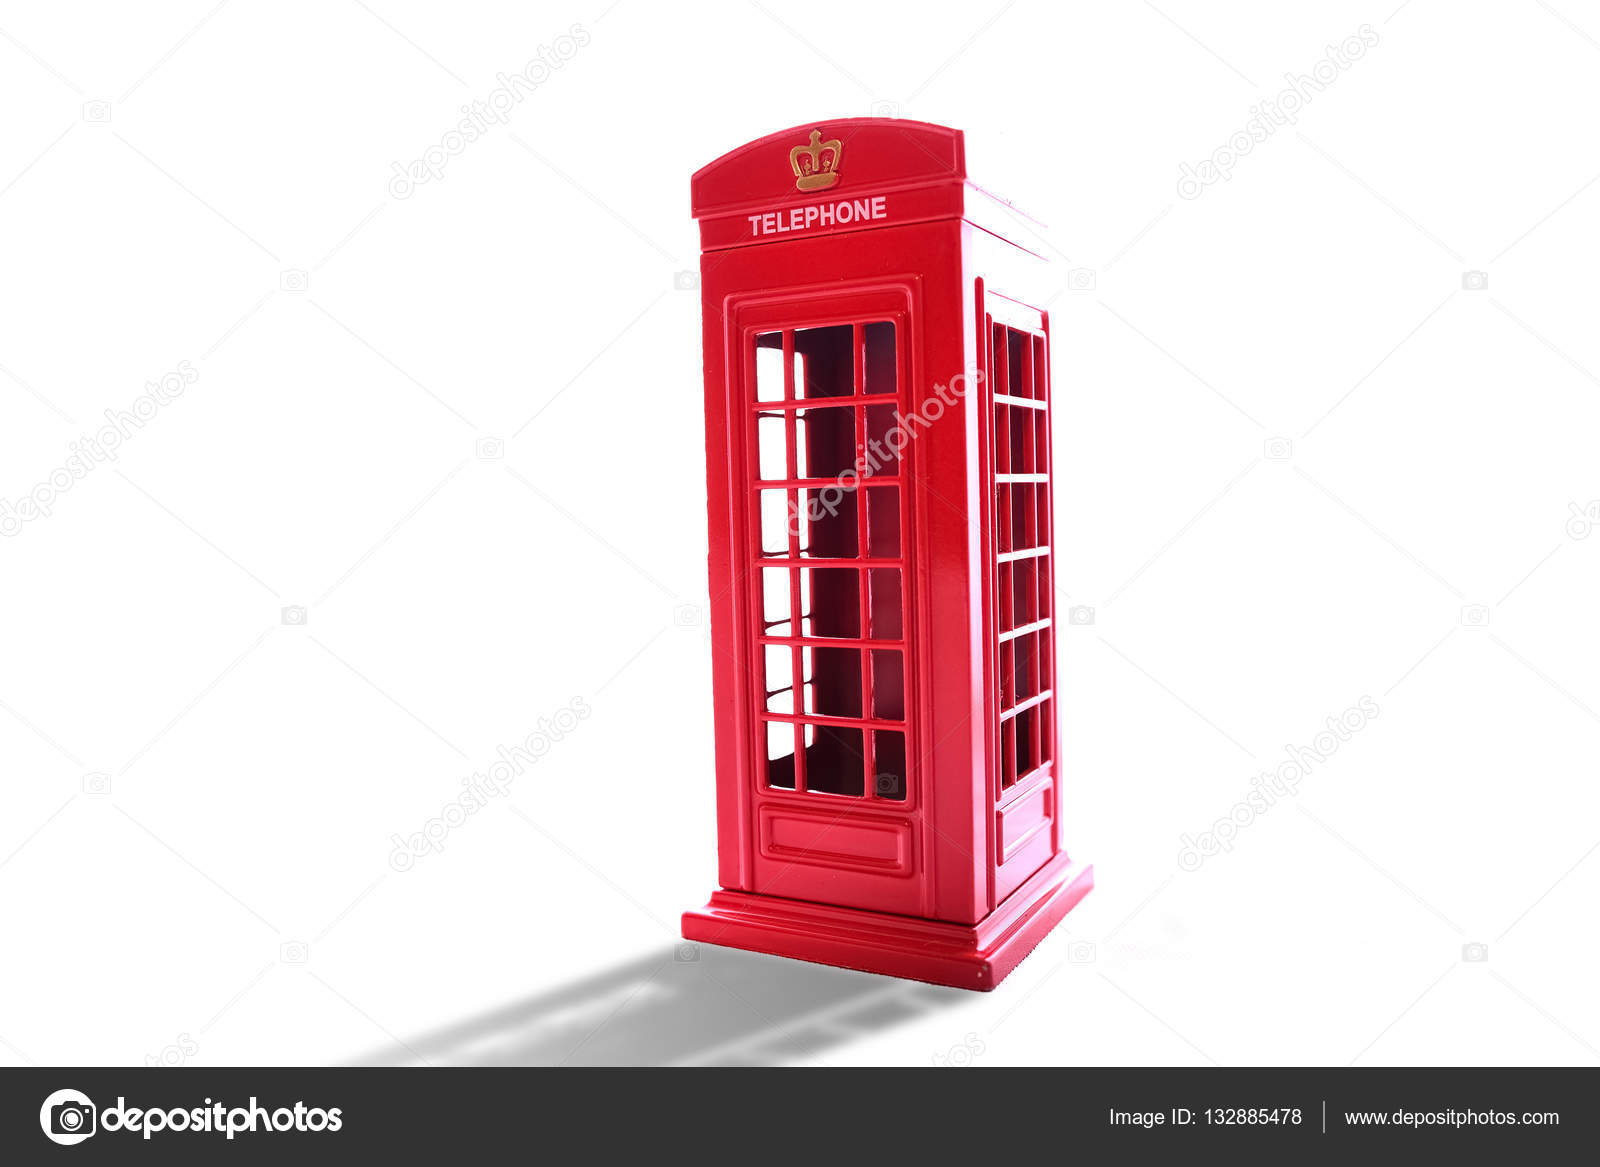 Cabina Telefonica : Cabina telefonica inglese u2014 foto stock © sbhaumik #132885478